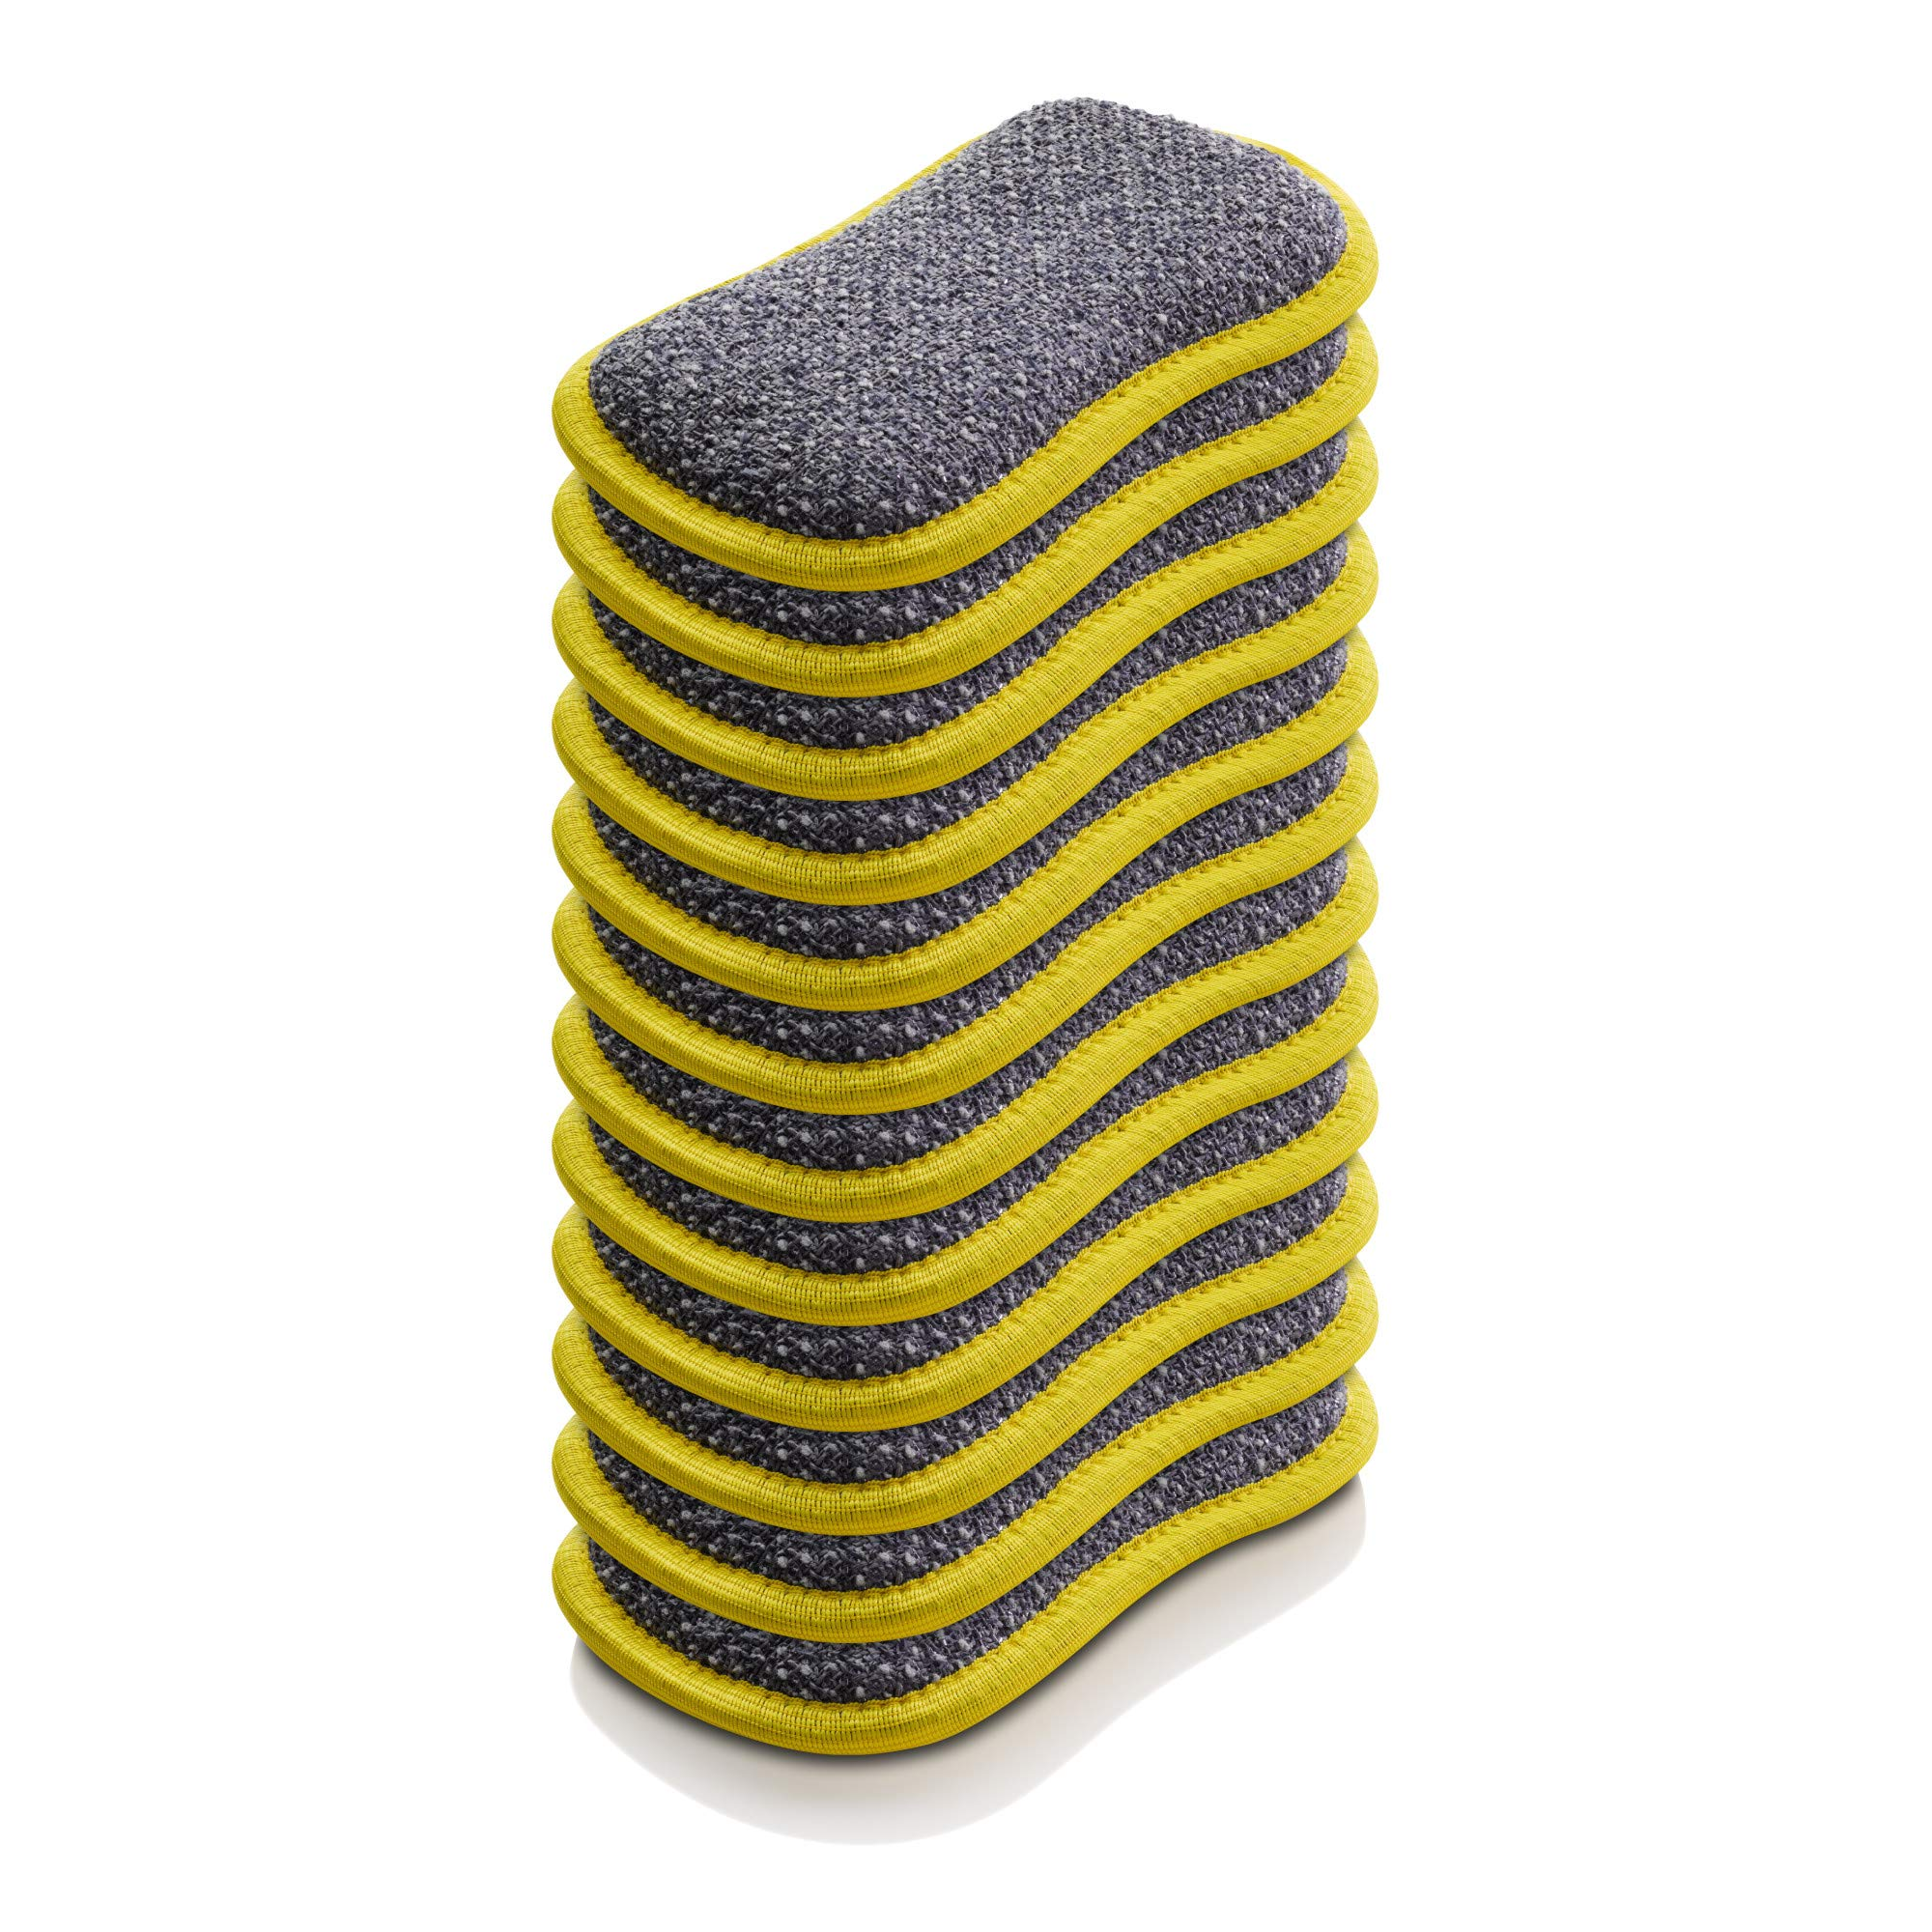 E-Cloth Microfiber Dual Purpose Washing Up Pad, Yellow, 12 Count